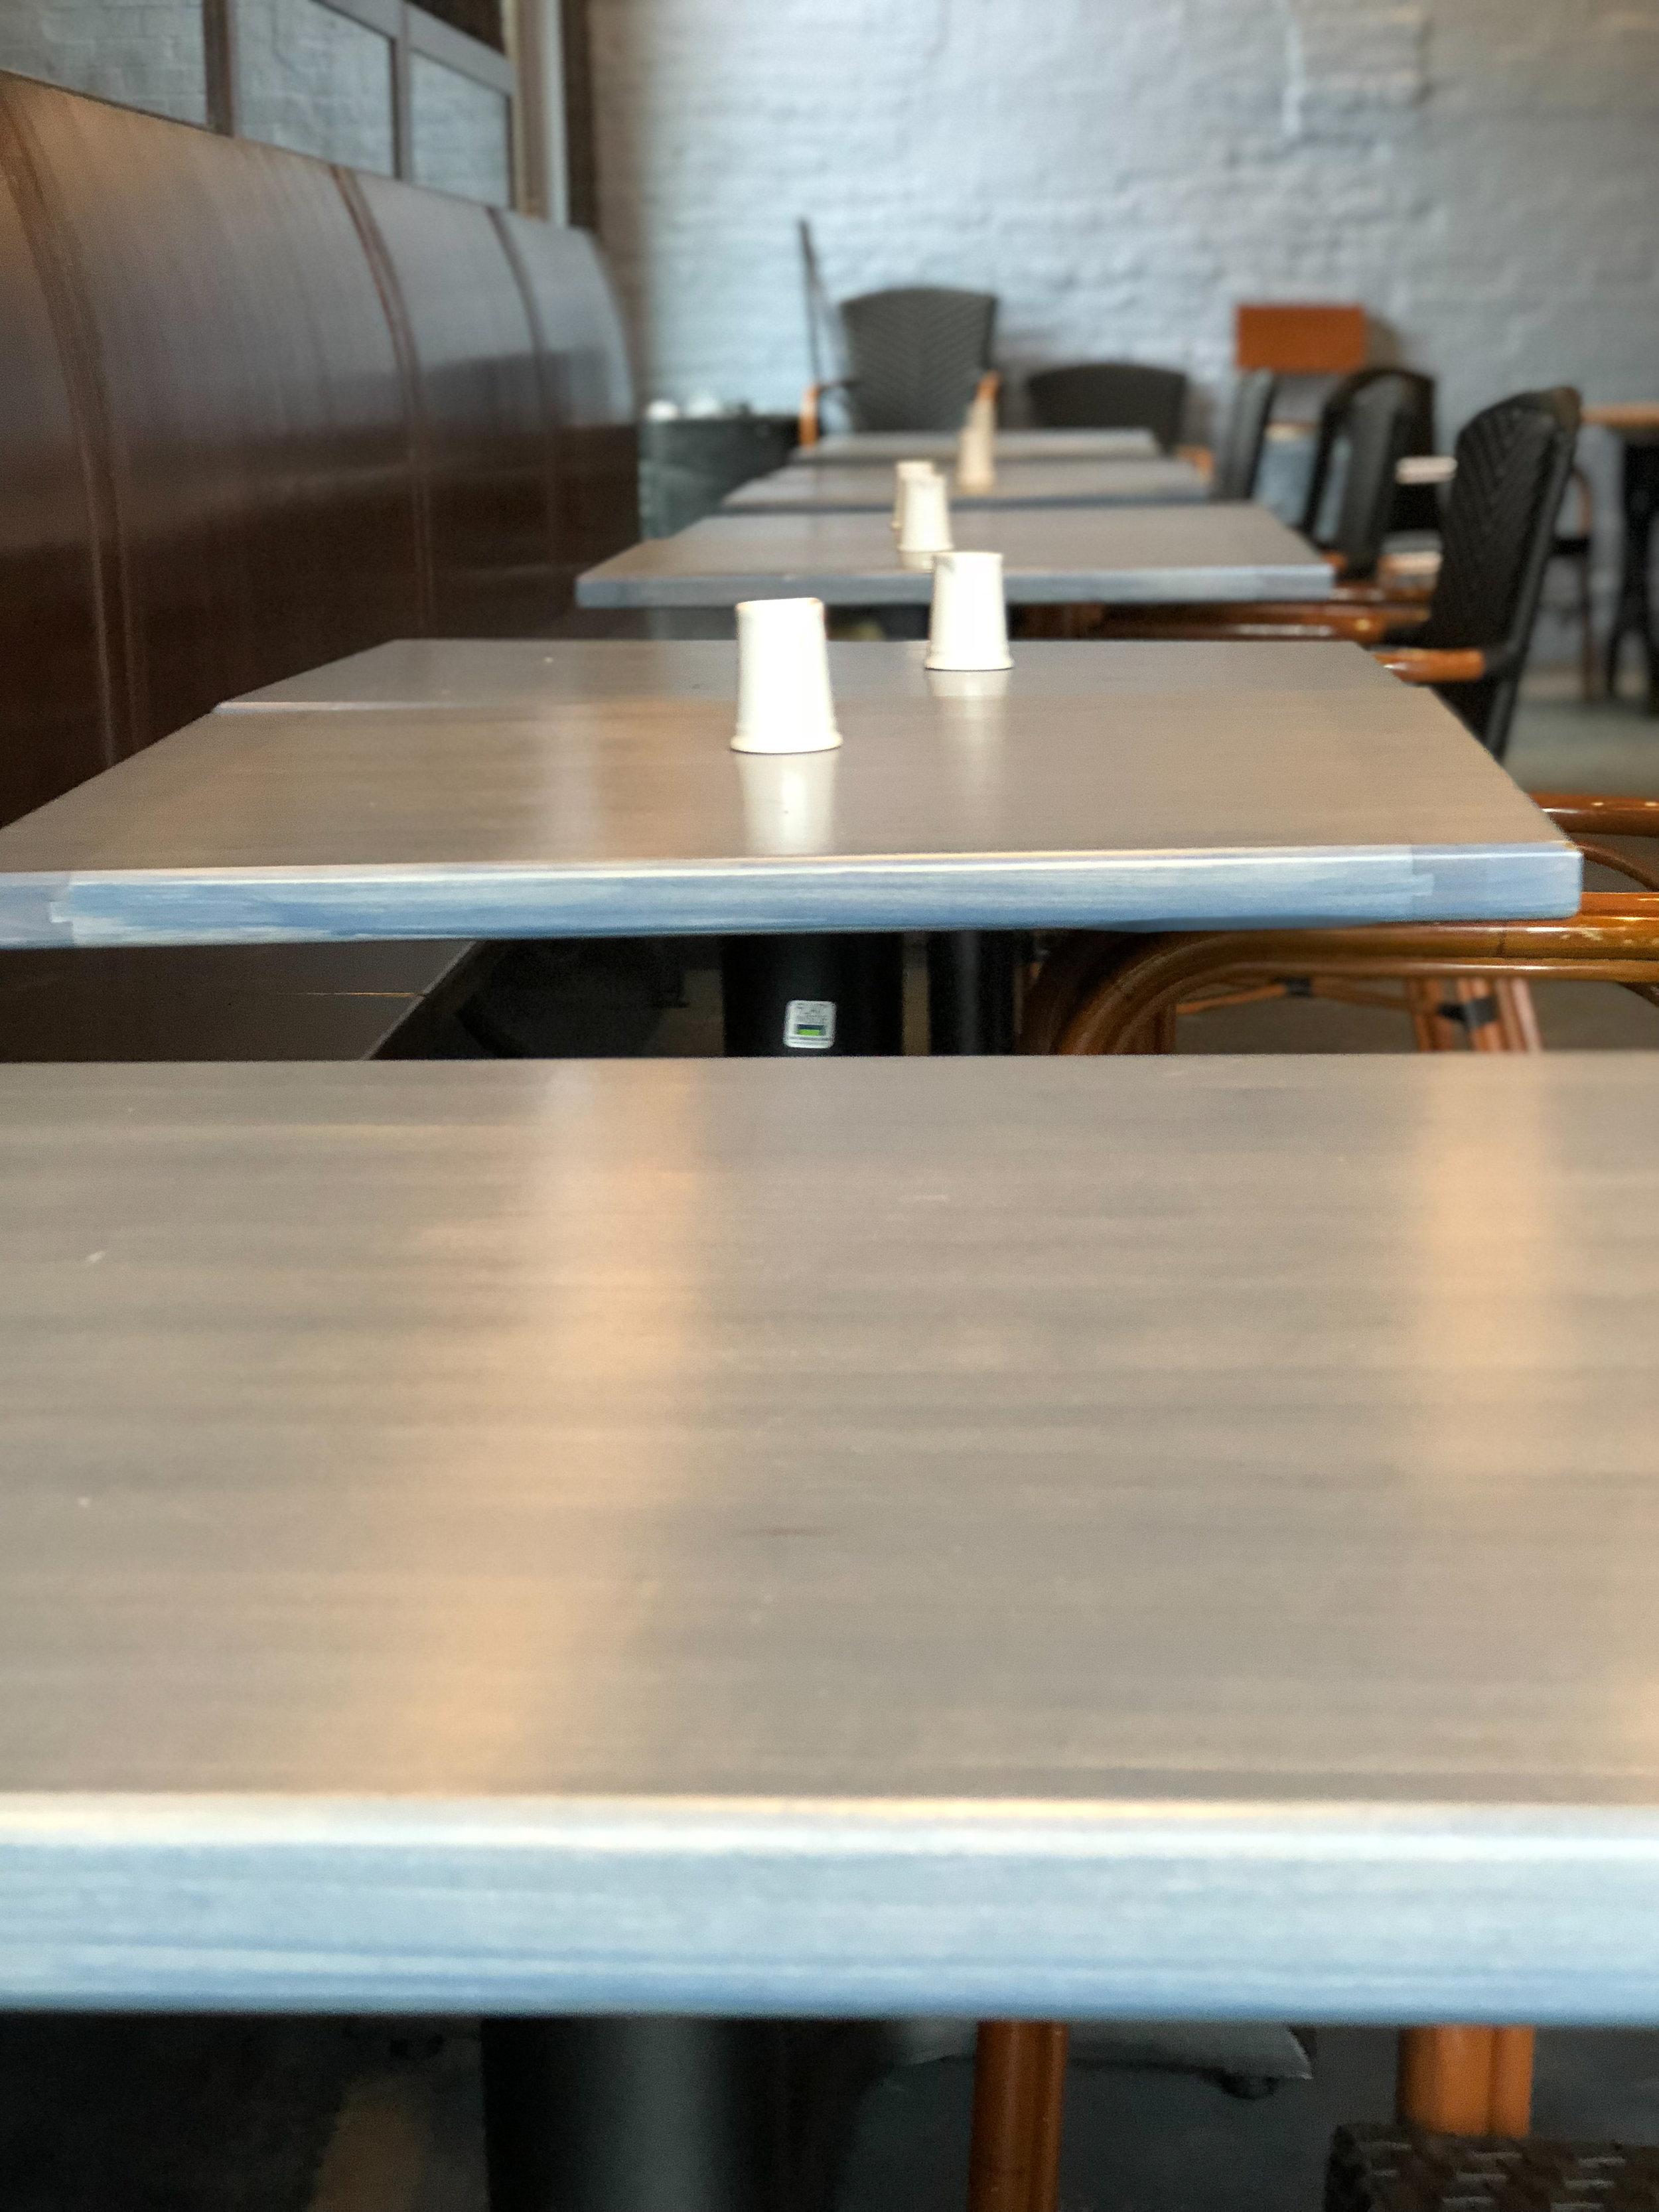 Clang Cafe Coffee Shop Furniture Bar Furniture Sallie Plumley Studio Richmond Virginia Sally Plumley Custom Woodworking and Furniture Design